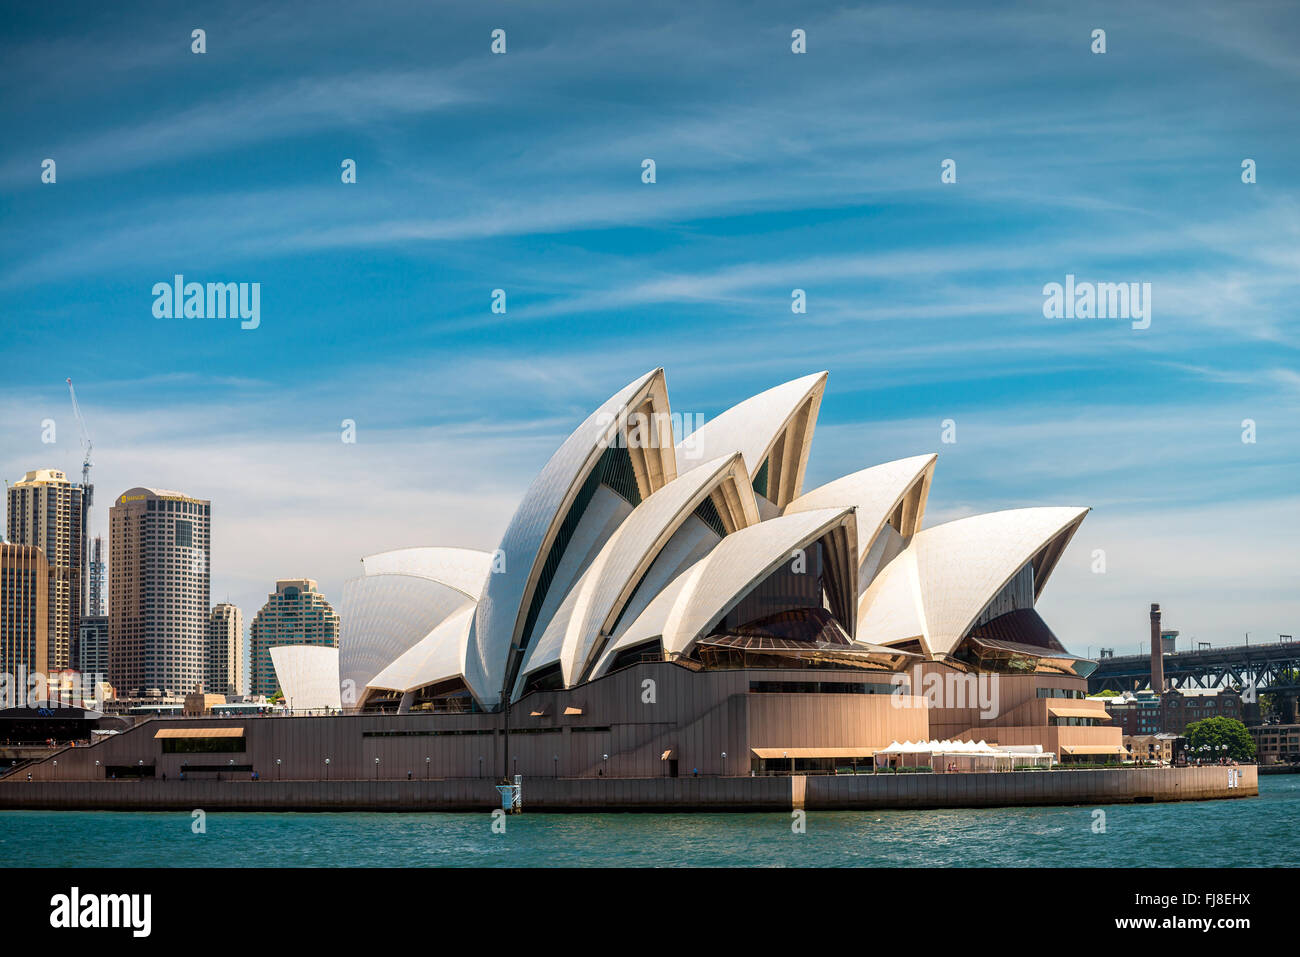 Sydney, Australien - 10. November 2015: The Sydney Opera House ist ein Multi-Veranstaltungsort Performing Arts Center Stockfoto